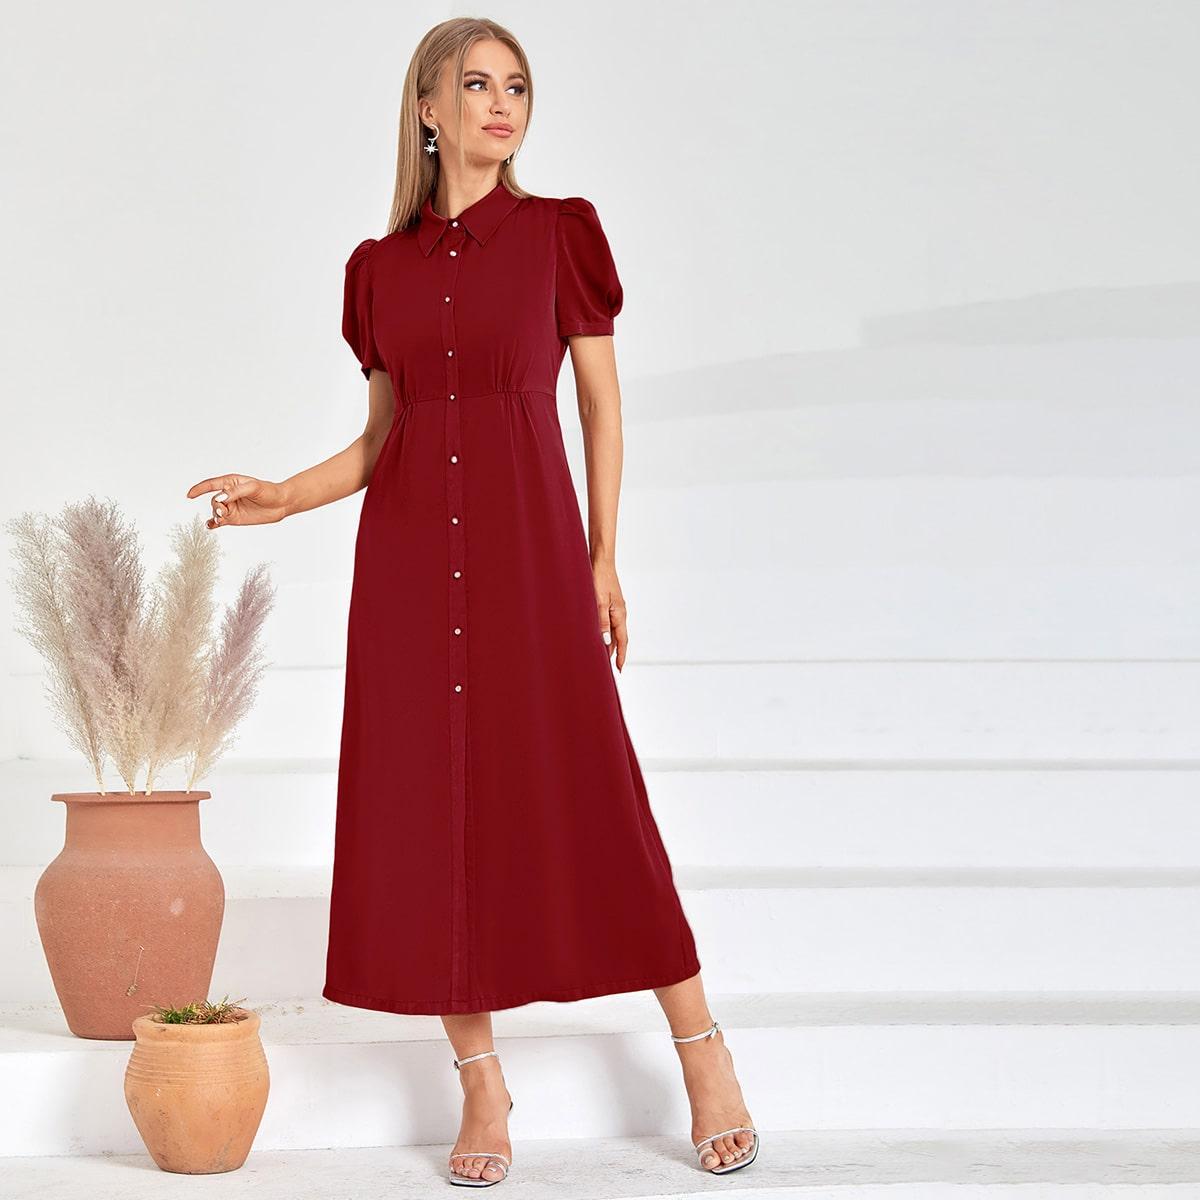 Атласное платье-рубашка с пышным рукавом SheIn swdress25210429293